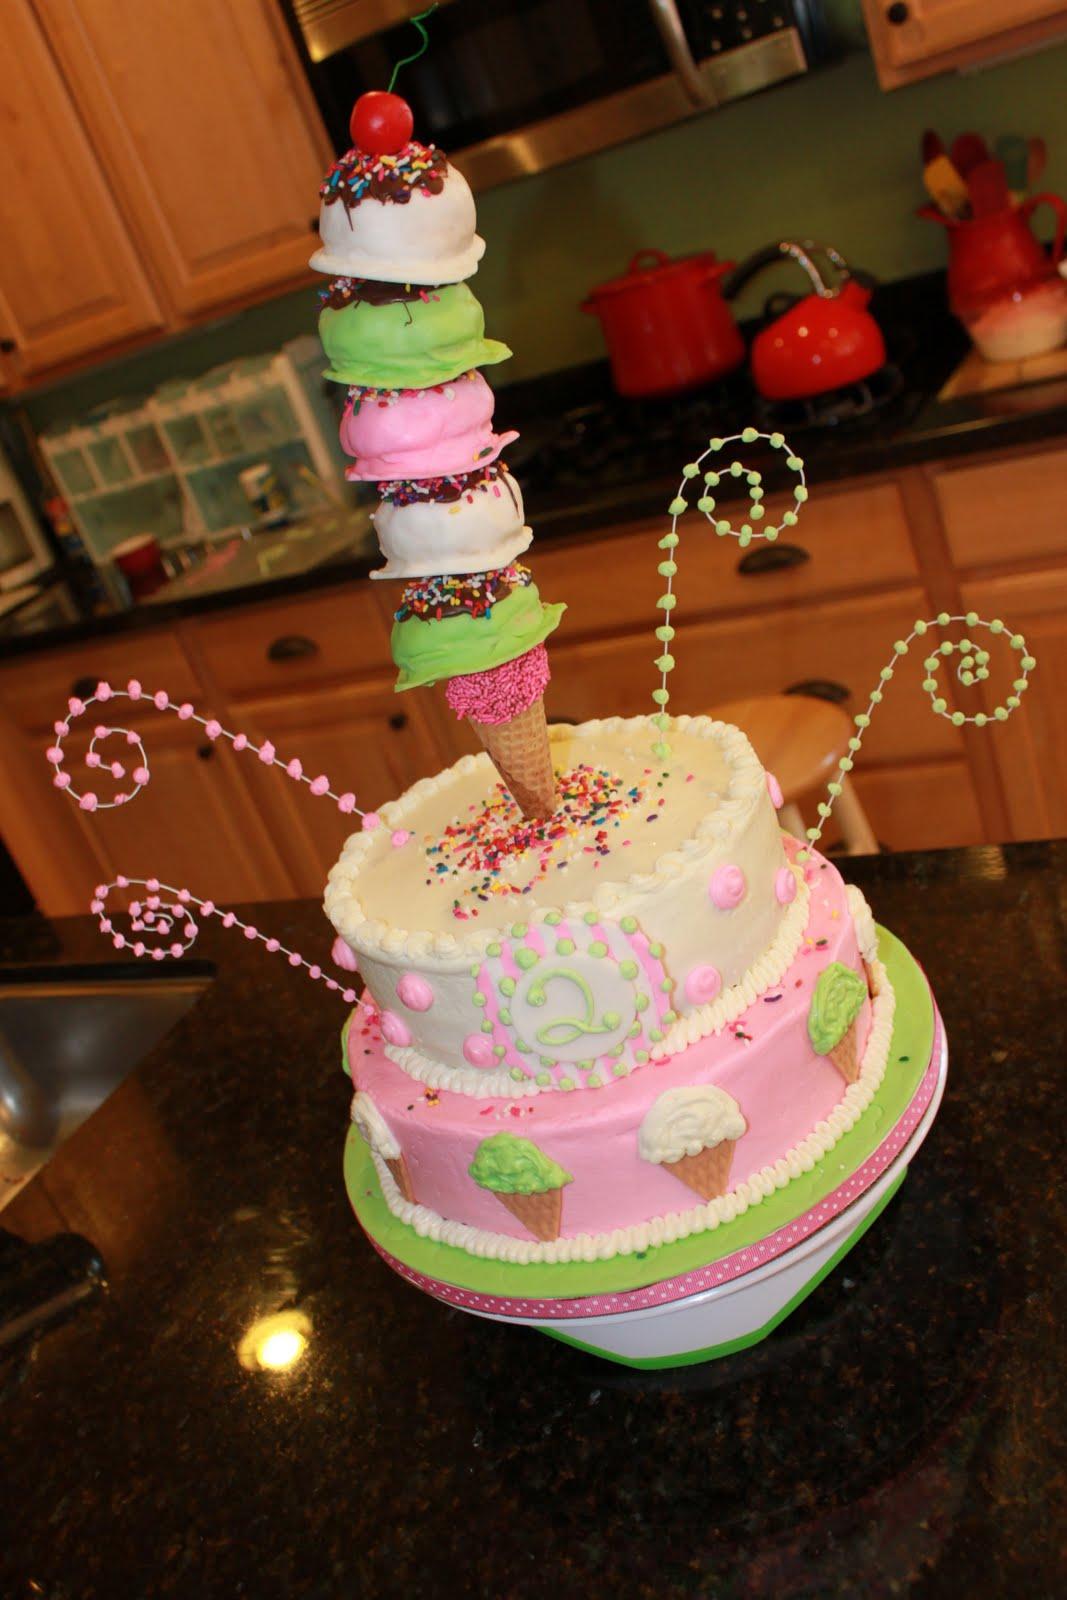 Ice Cream Themed Cake : Katiediditcakes: Ice Cream theme cake